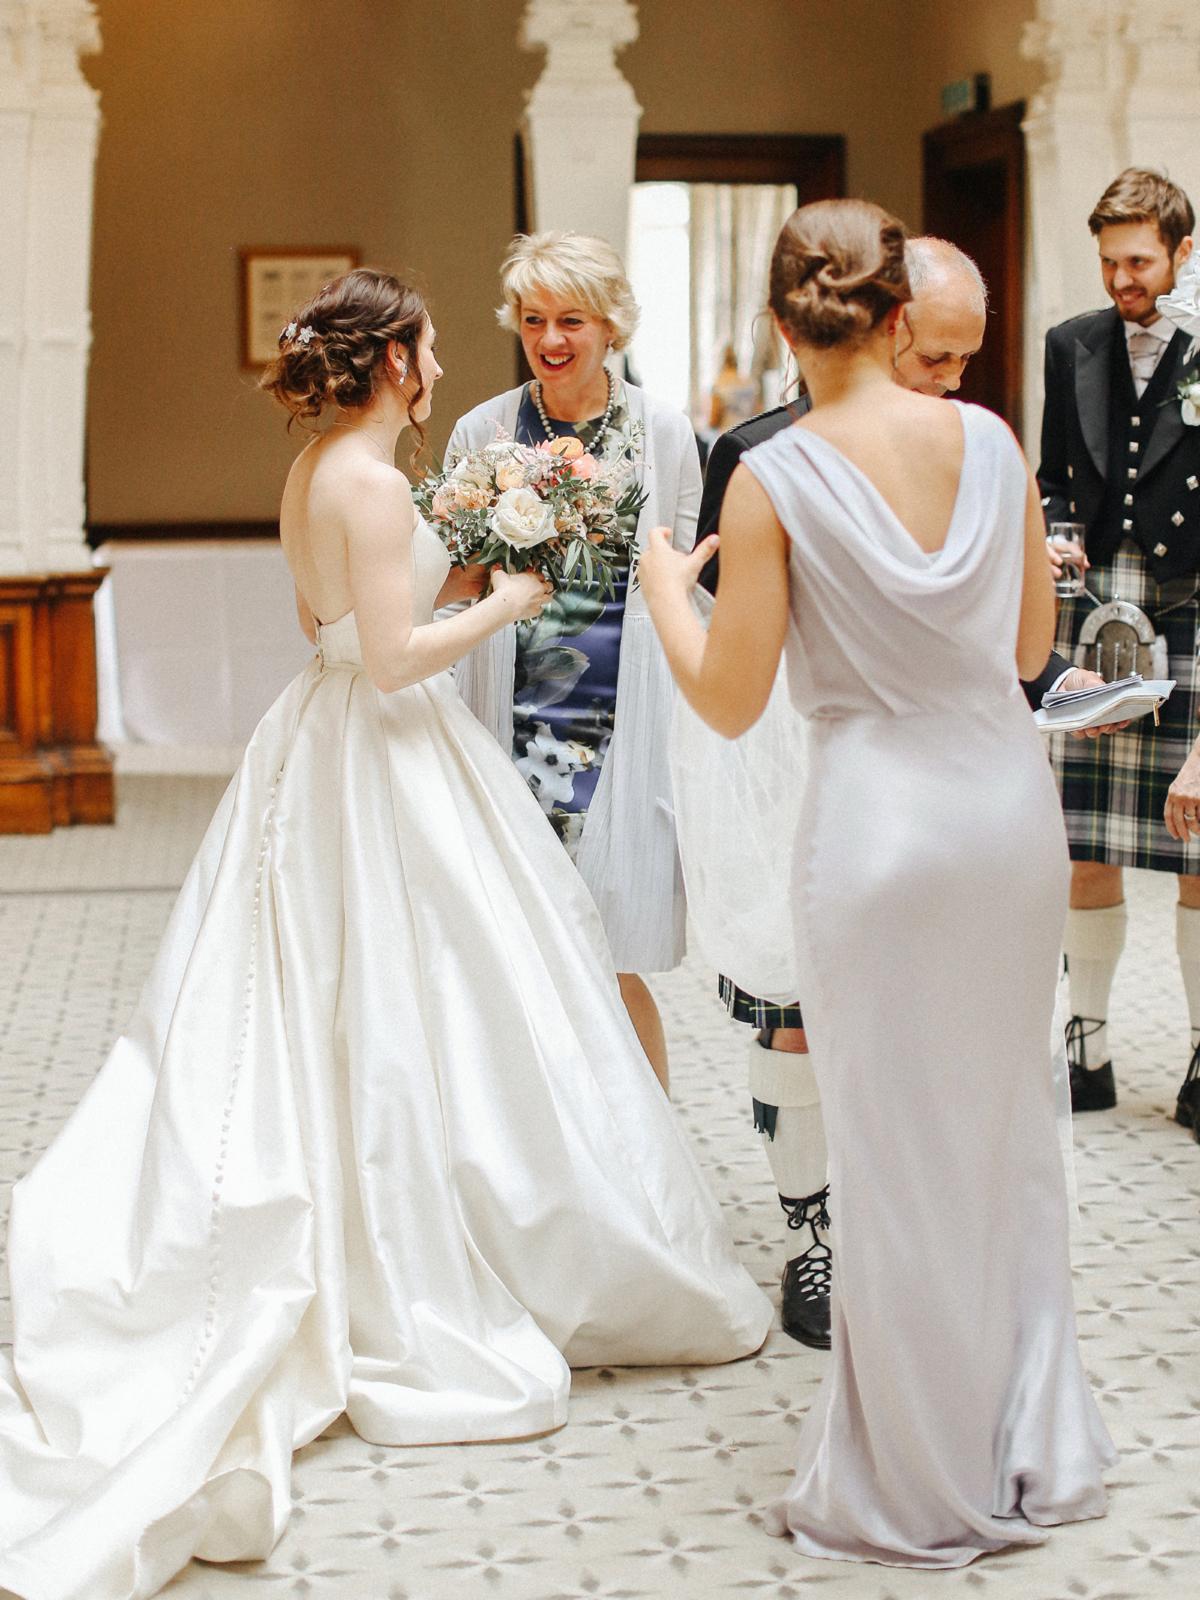 A Caroline Castigliano gown for an elegant peach Manor House wedding - A Caroline Castigliano Gown for a Chic and Classic Manor House Wedding in Shades of Peach